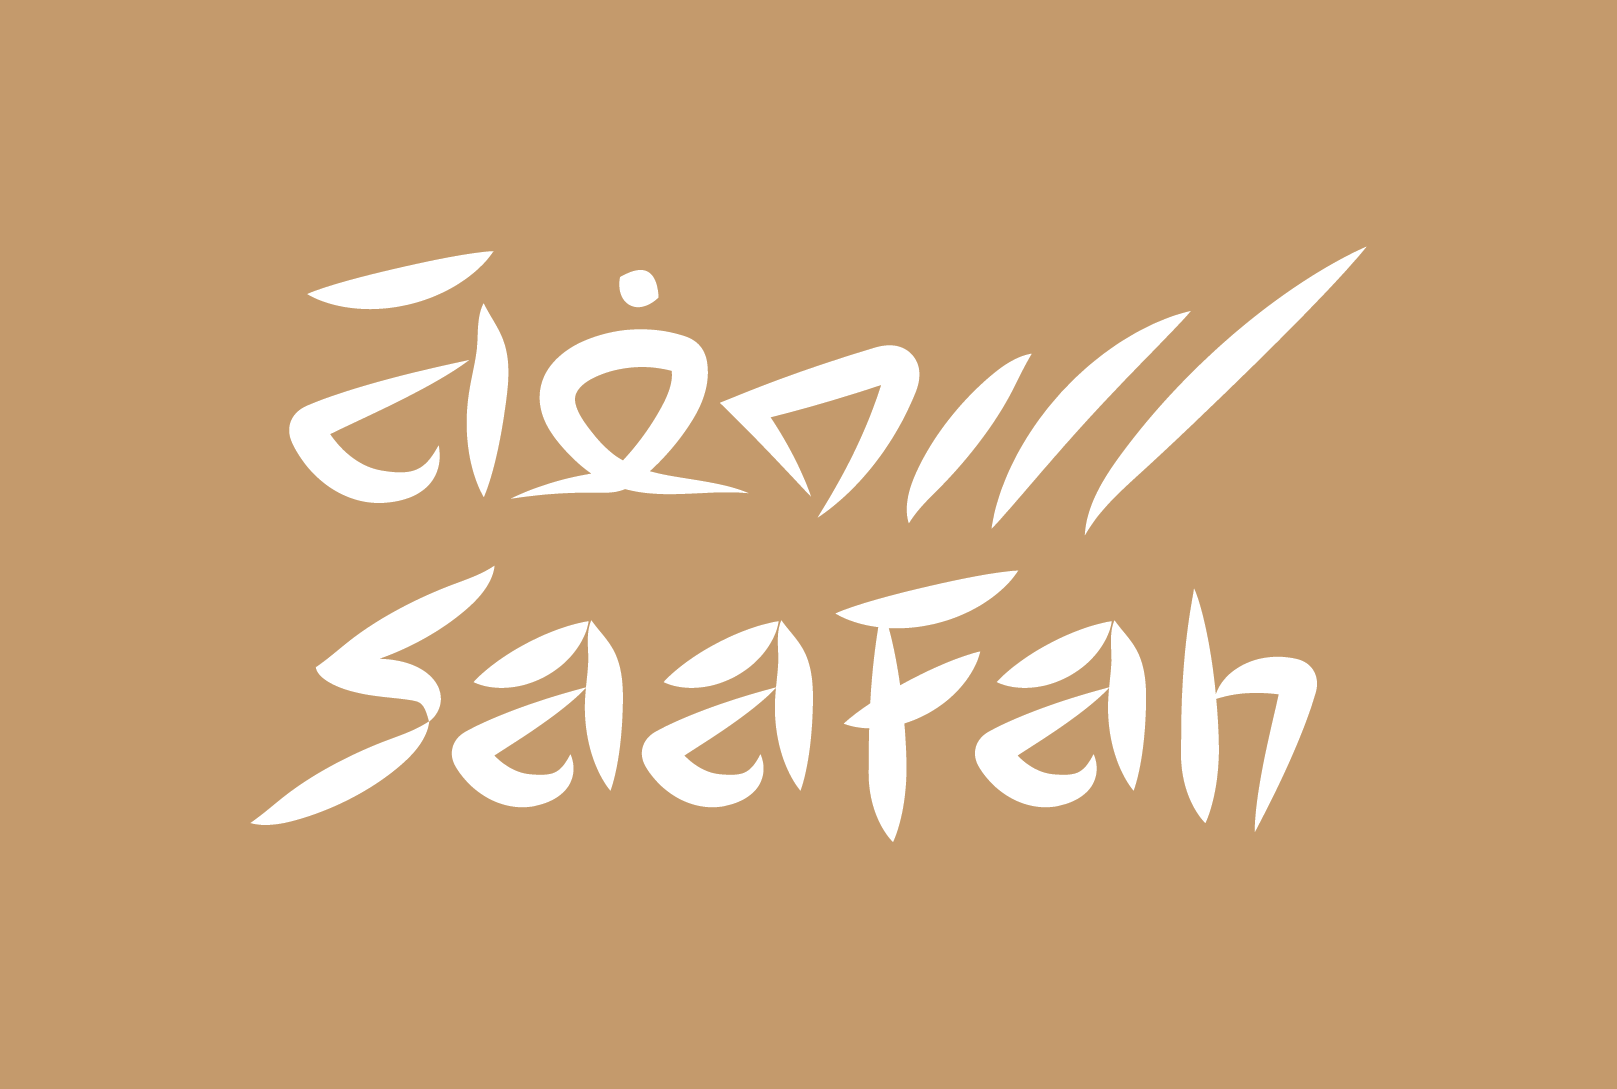 SAAFAH